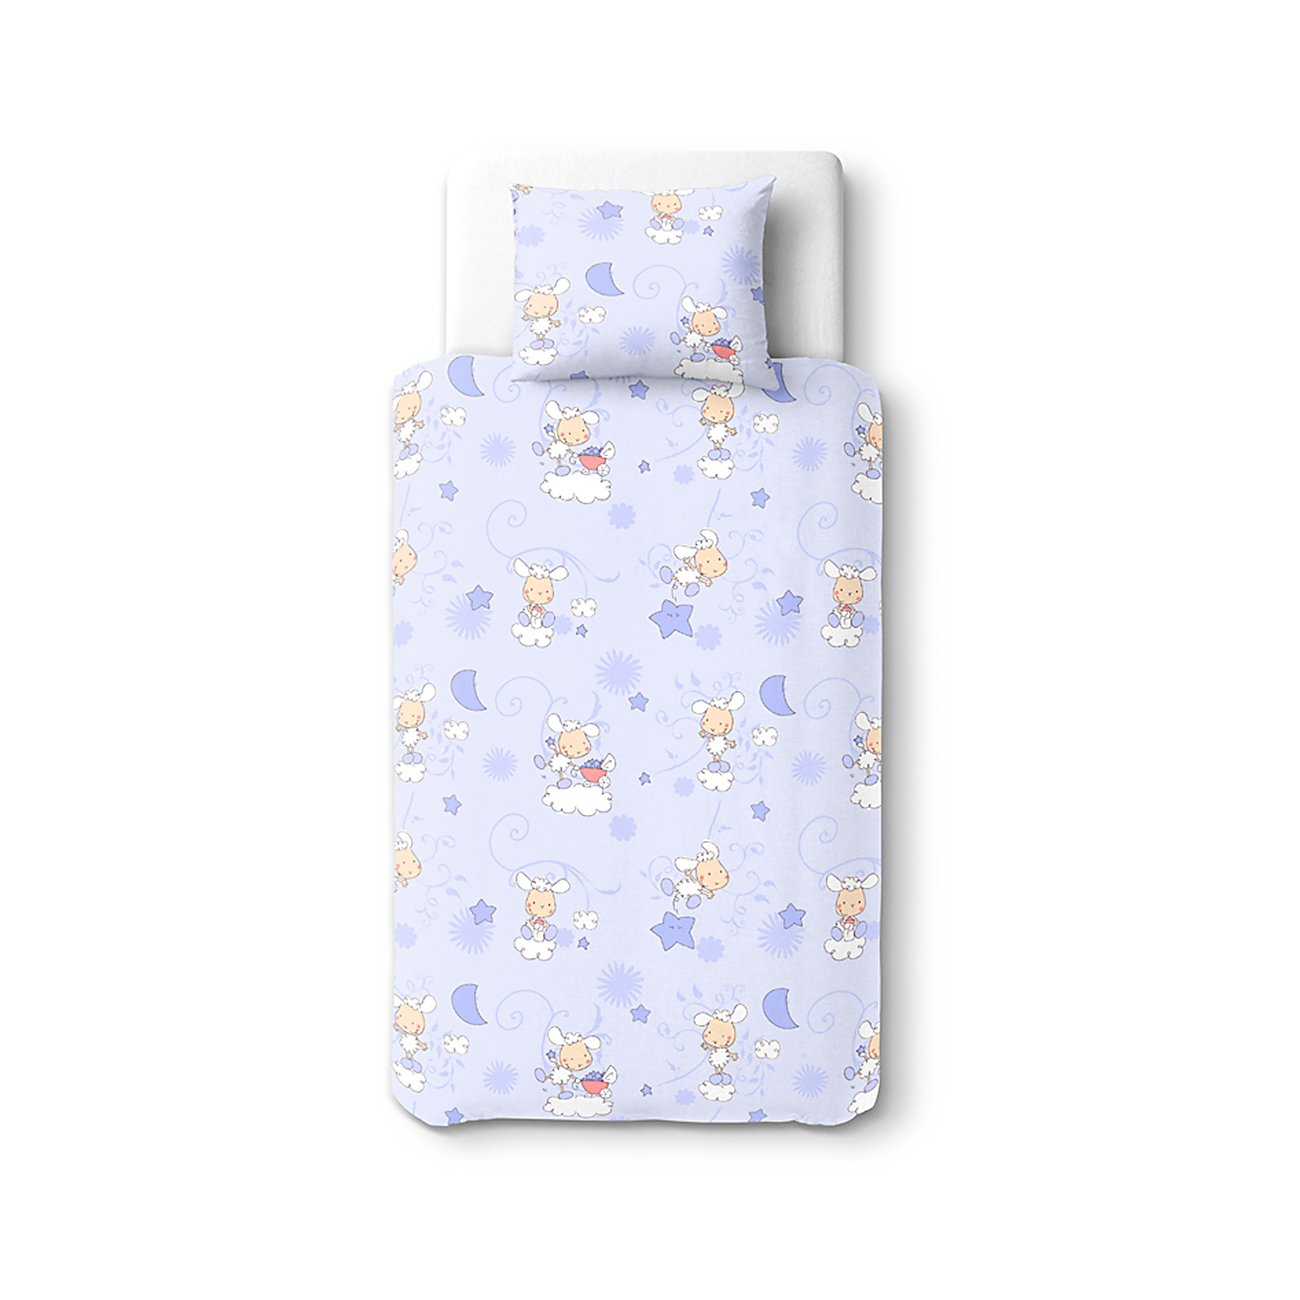 Baby Happy Lambs (Blue) – SoulBedroom 100% Cotton Bed Set (Duvet Cover 39''x 55'' cm & Pillow Case 15''x 23'' cm)